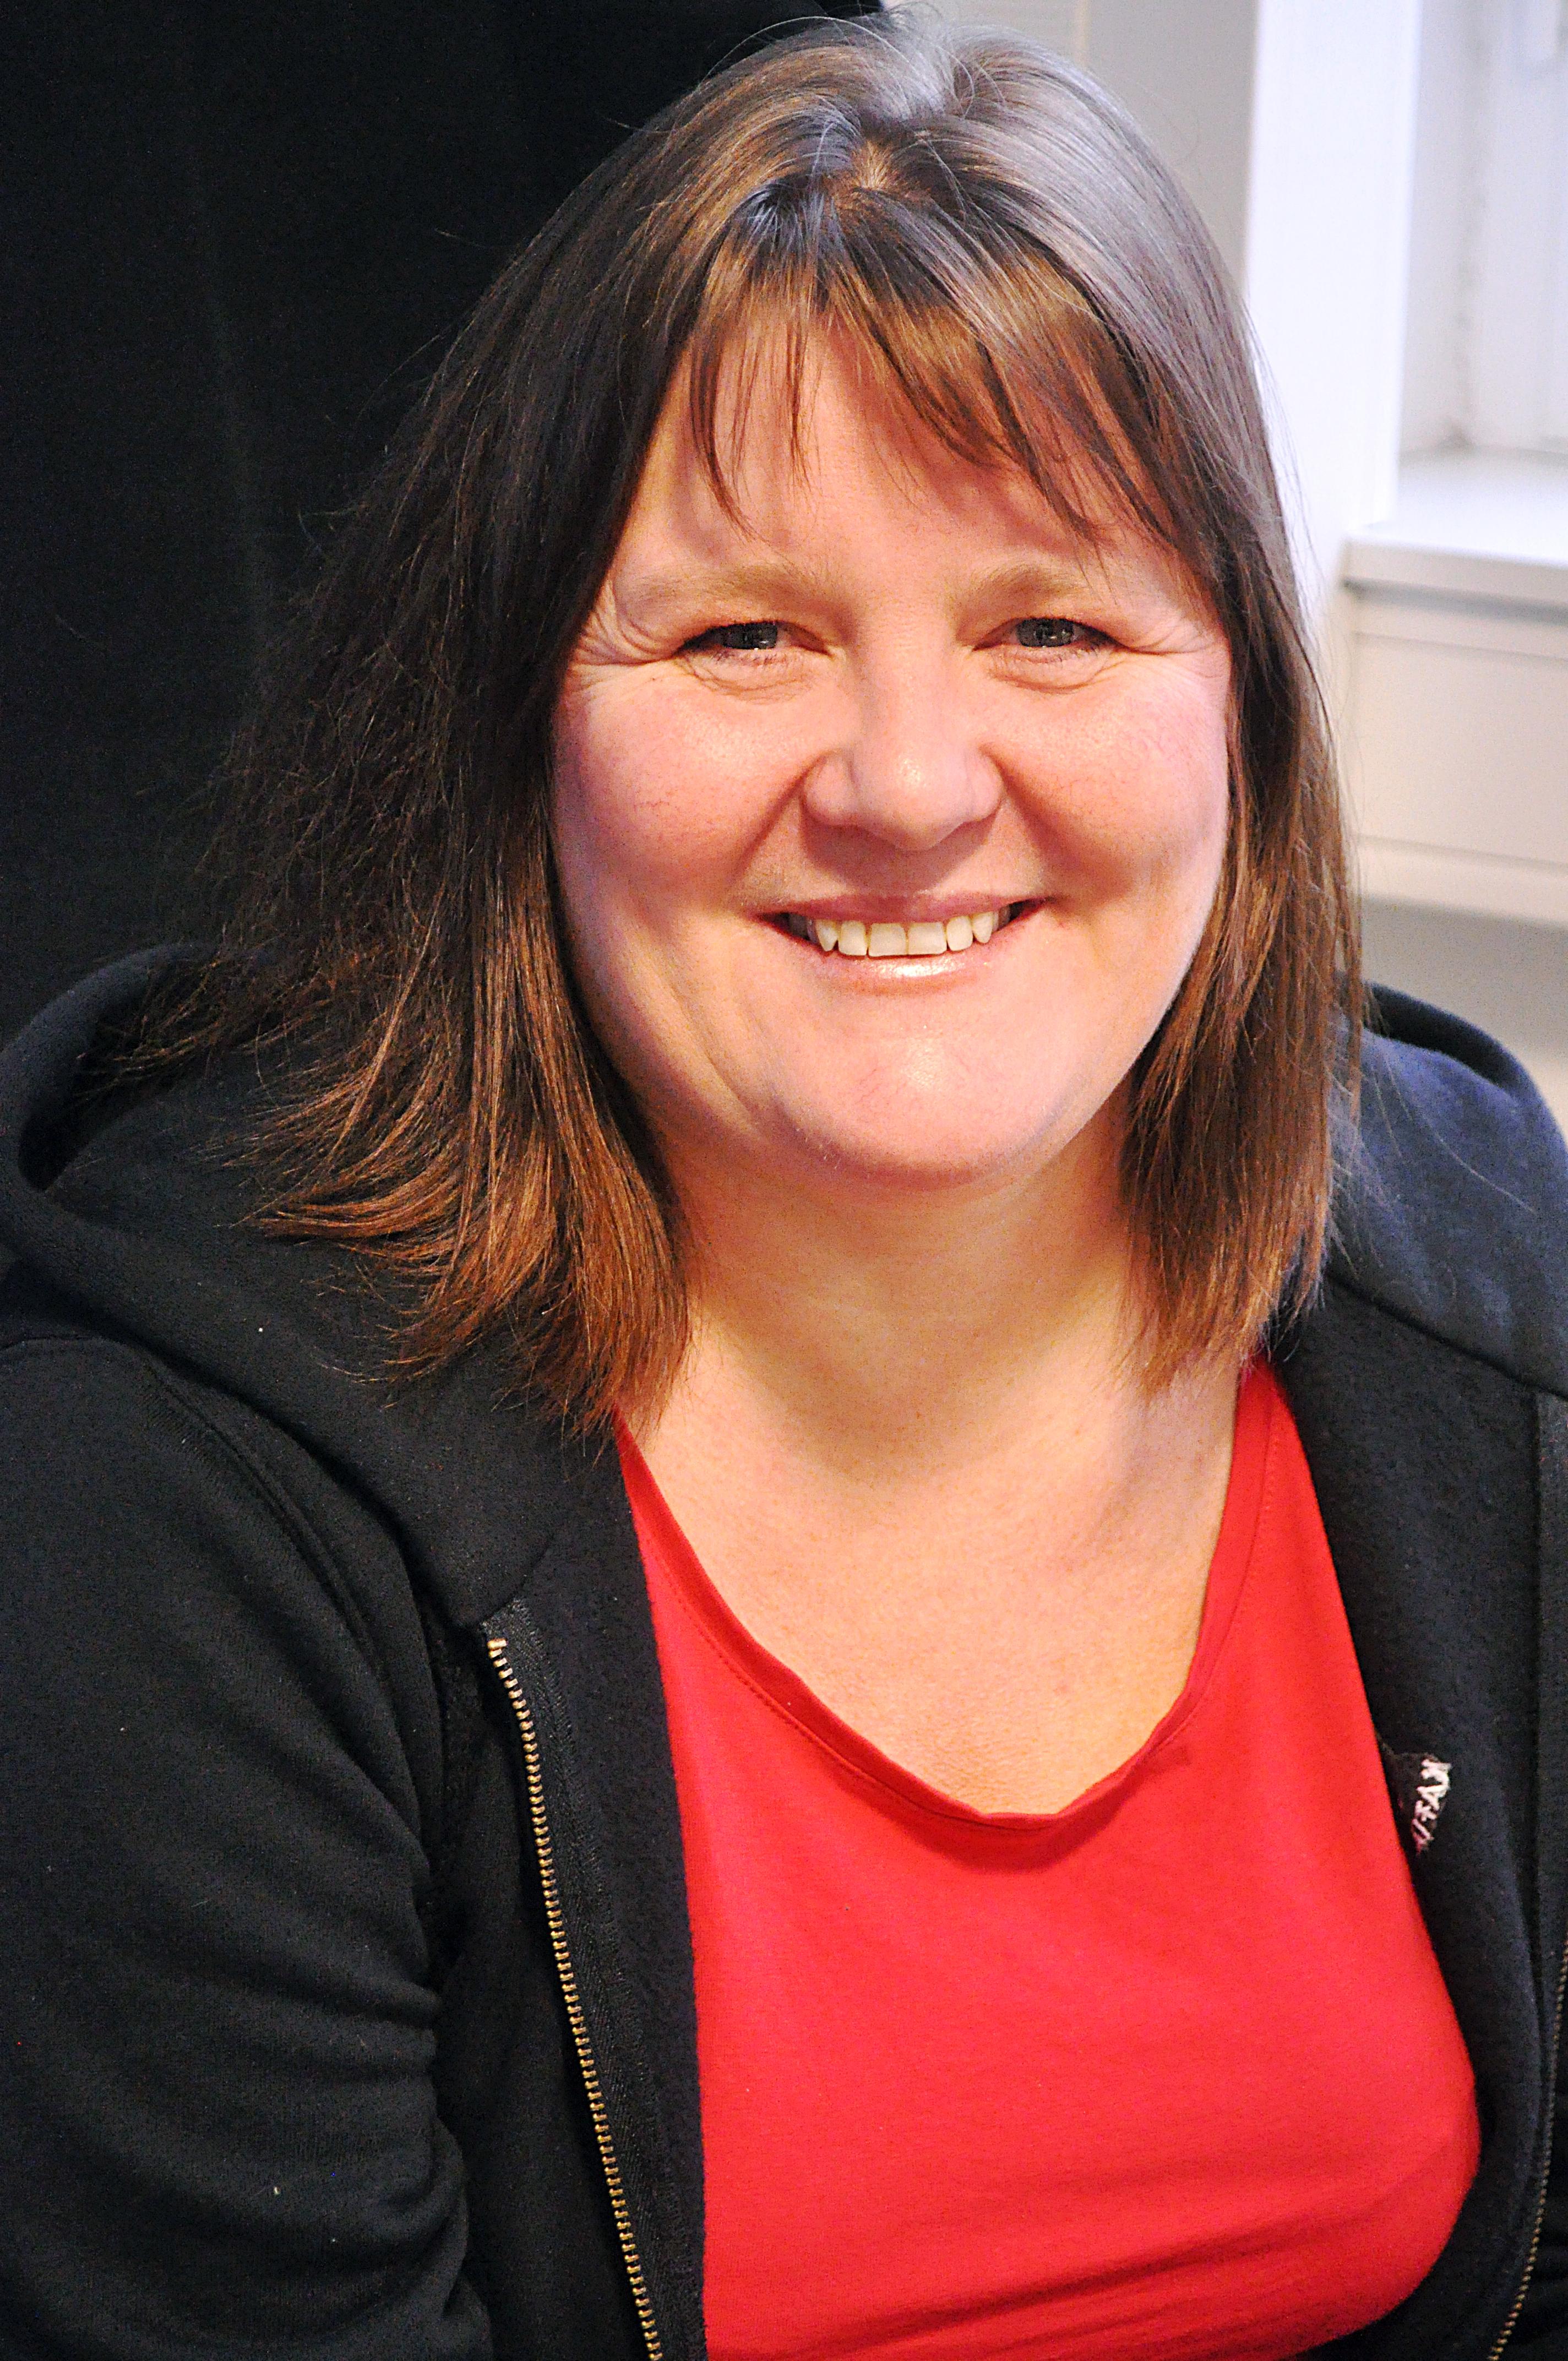 Lotta Isetoft Foto: Agnes Tångvik